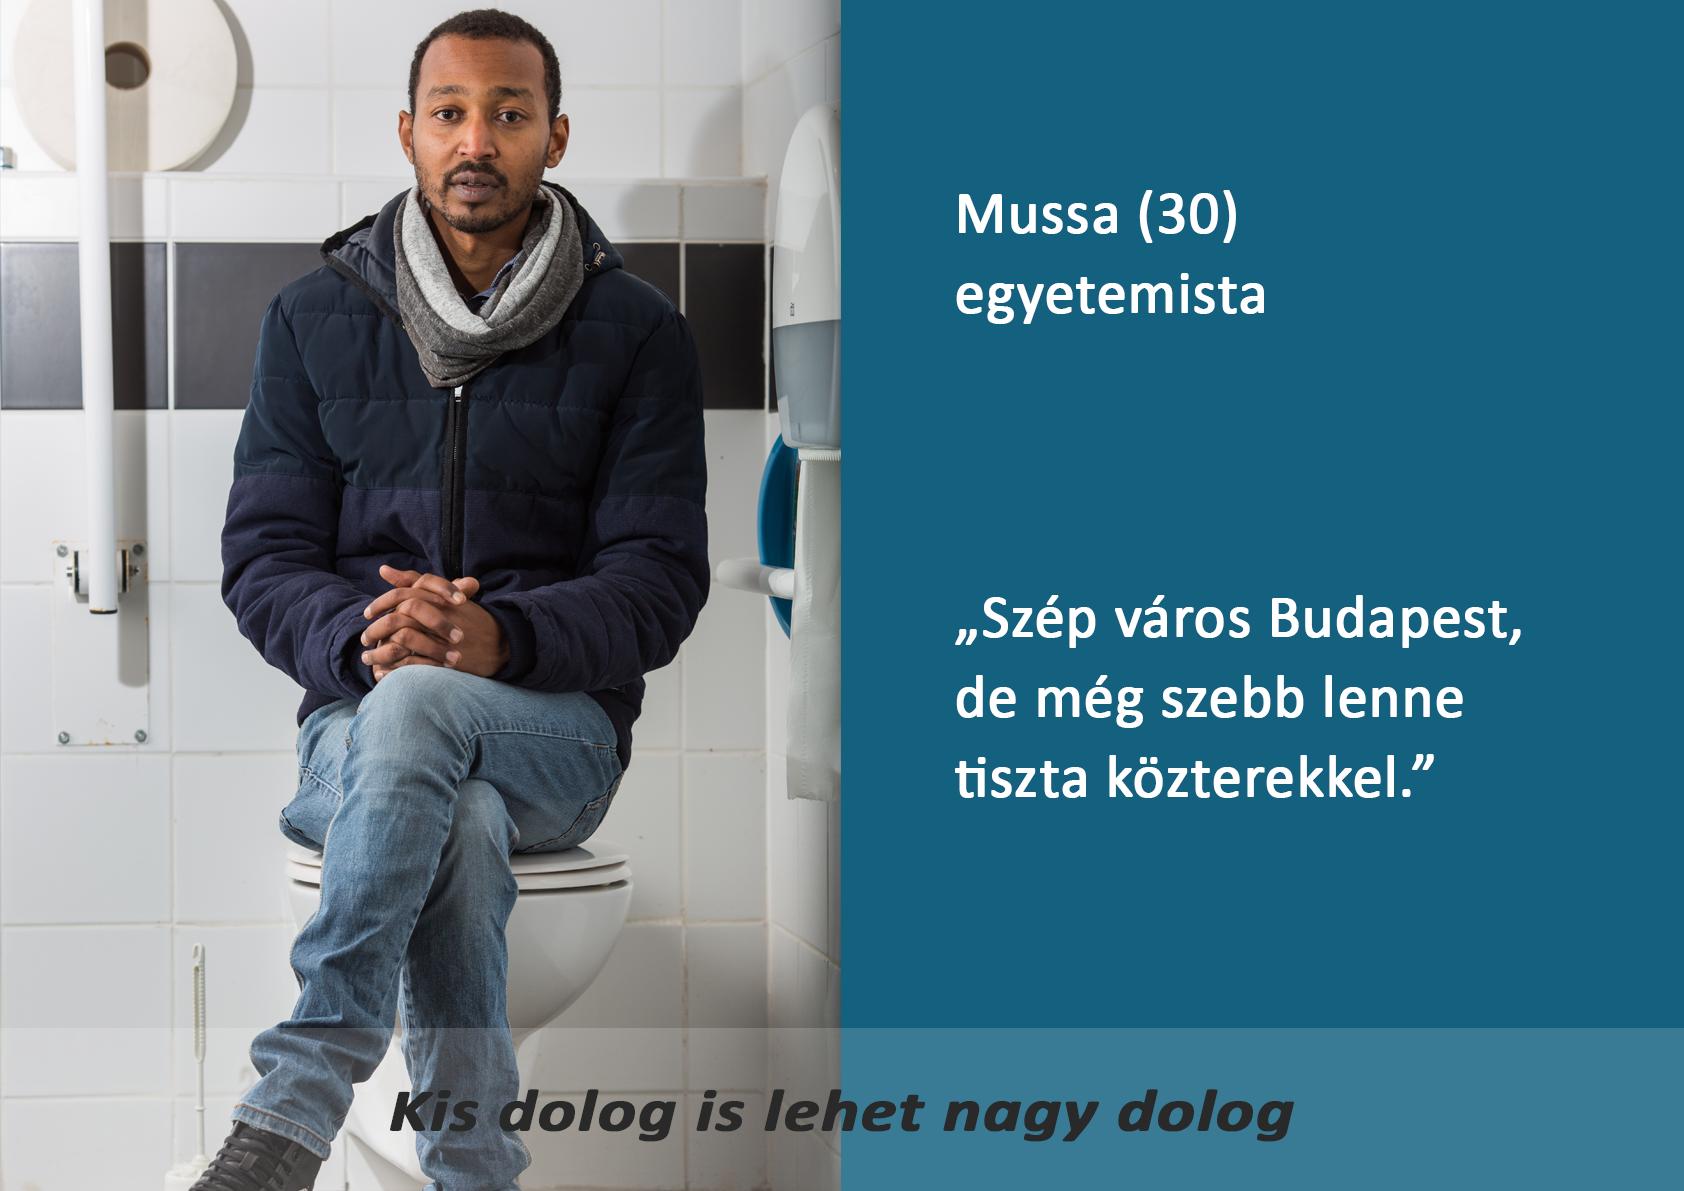 Mussa002